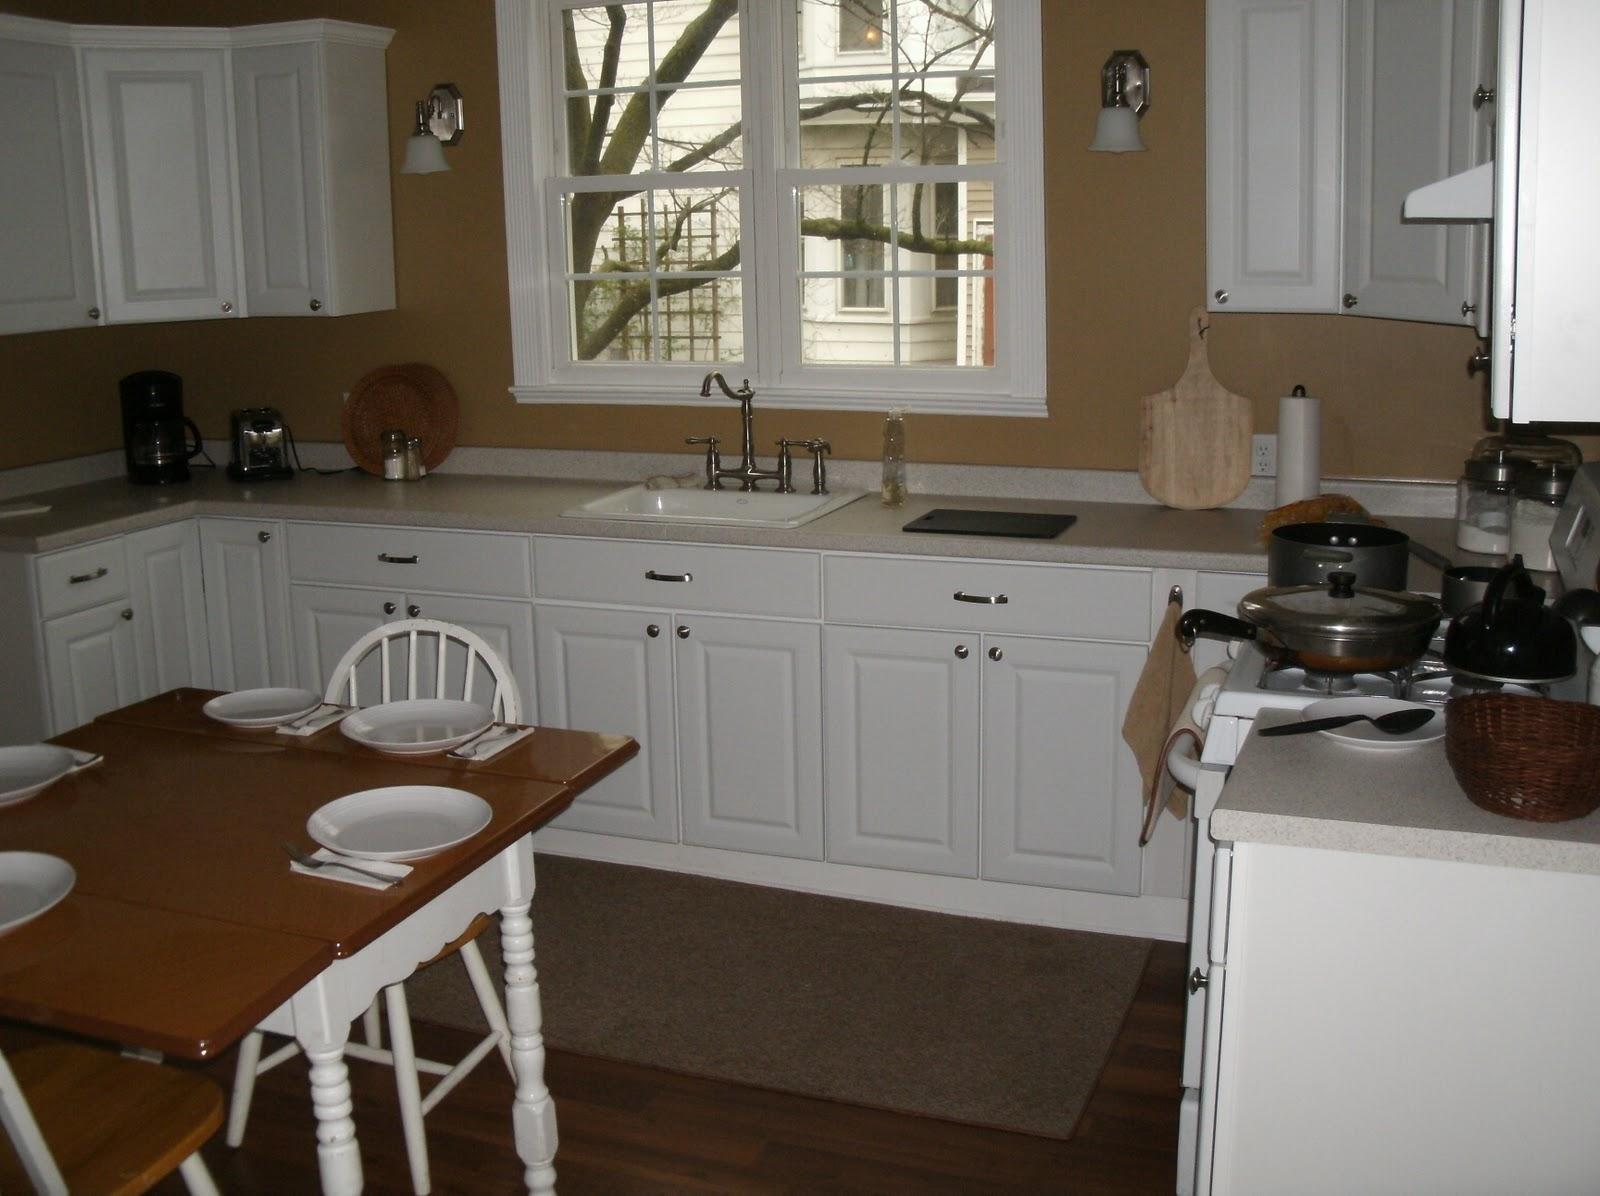 custom design installed kitchens kitchen remodeling nj Victorian Kitchen remodeling and Custom Kitchens Gloucester County Contractors NJ PA DE